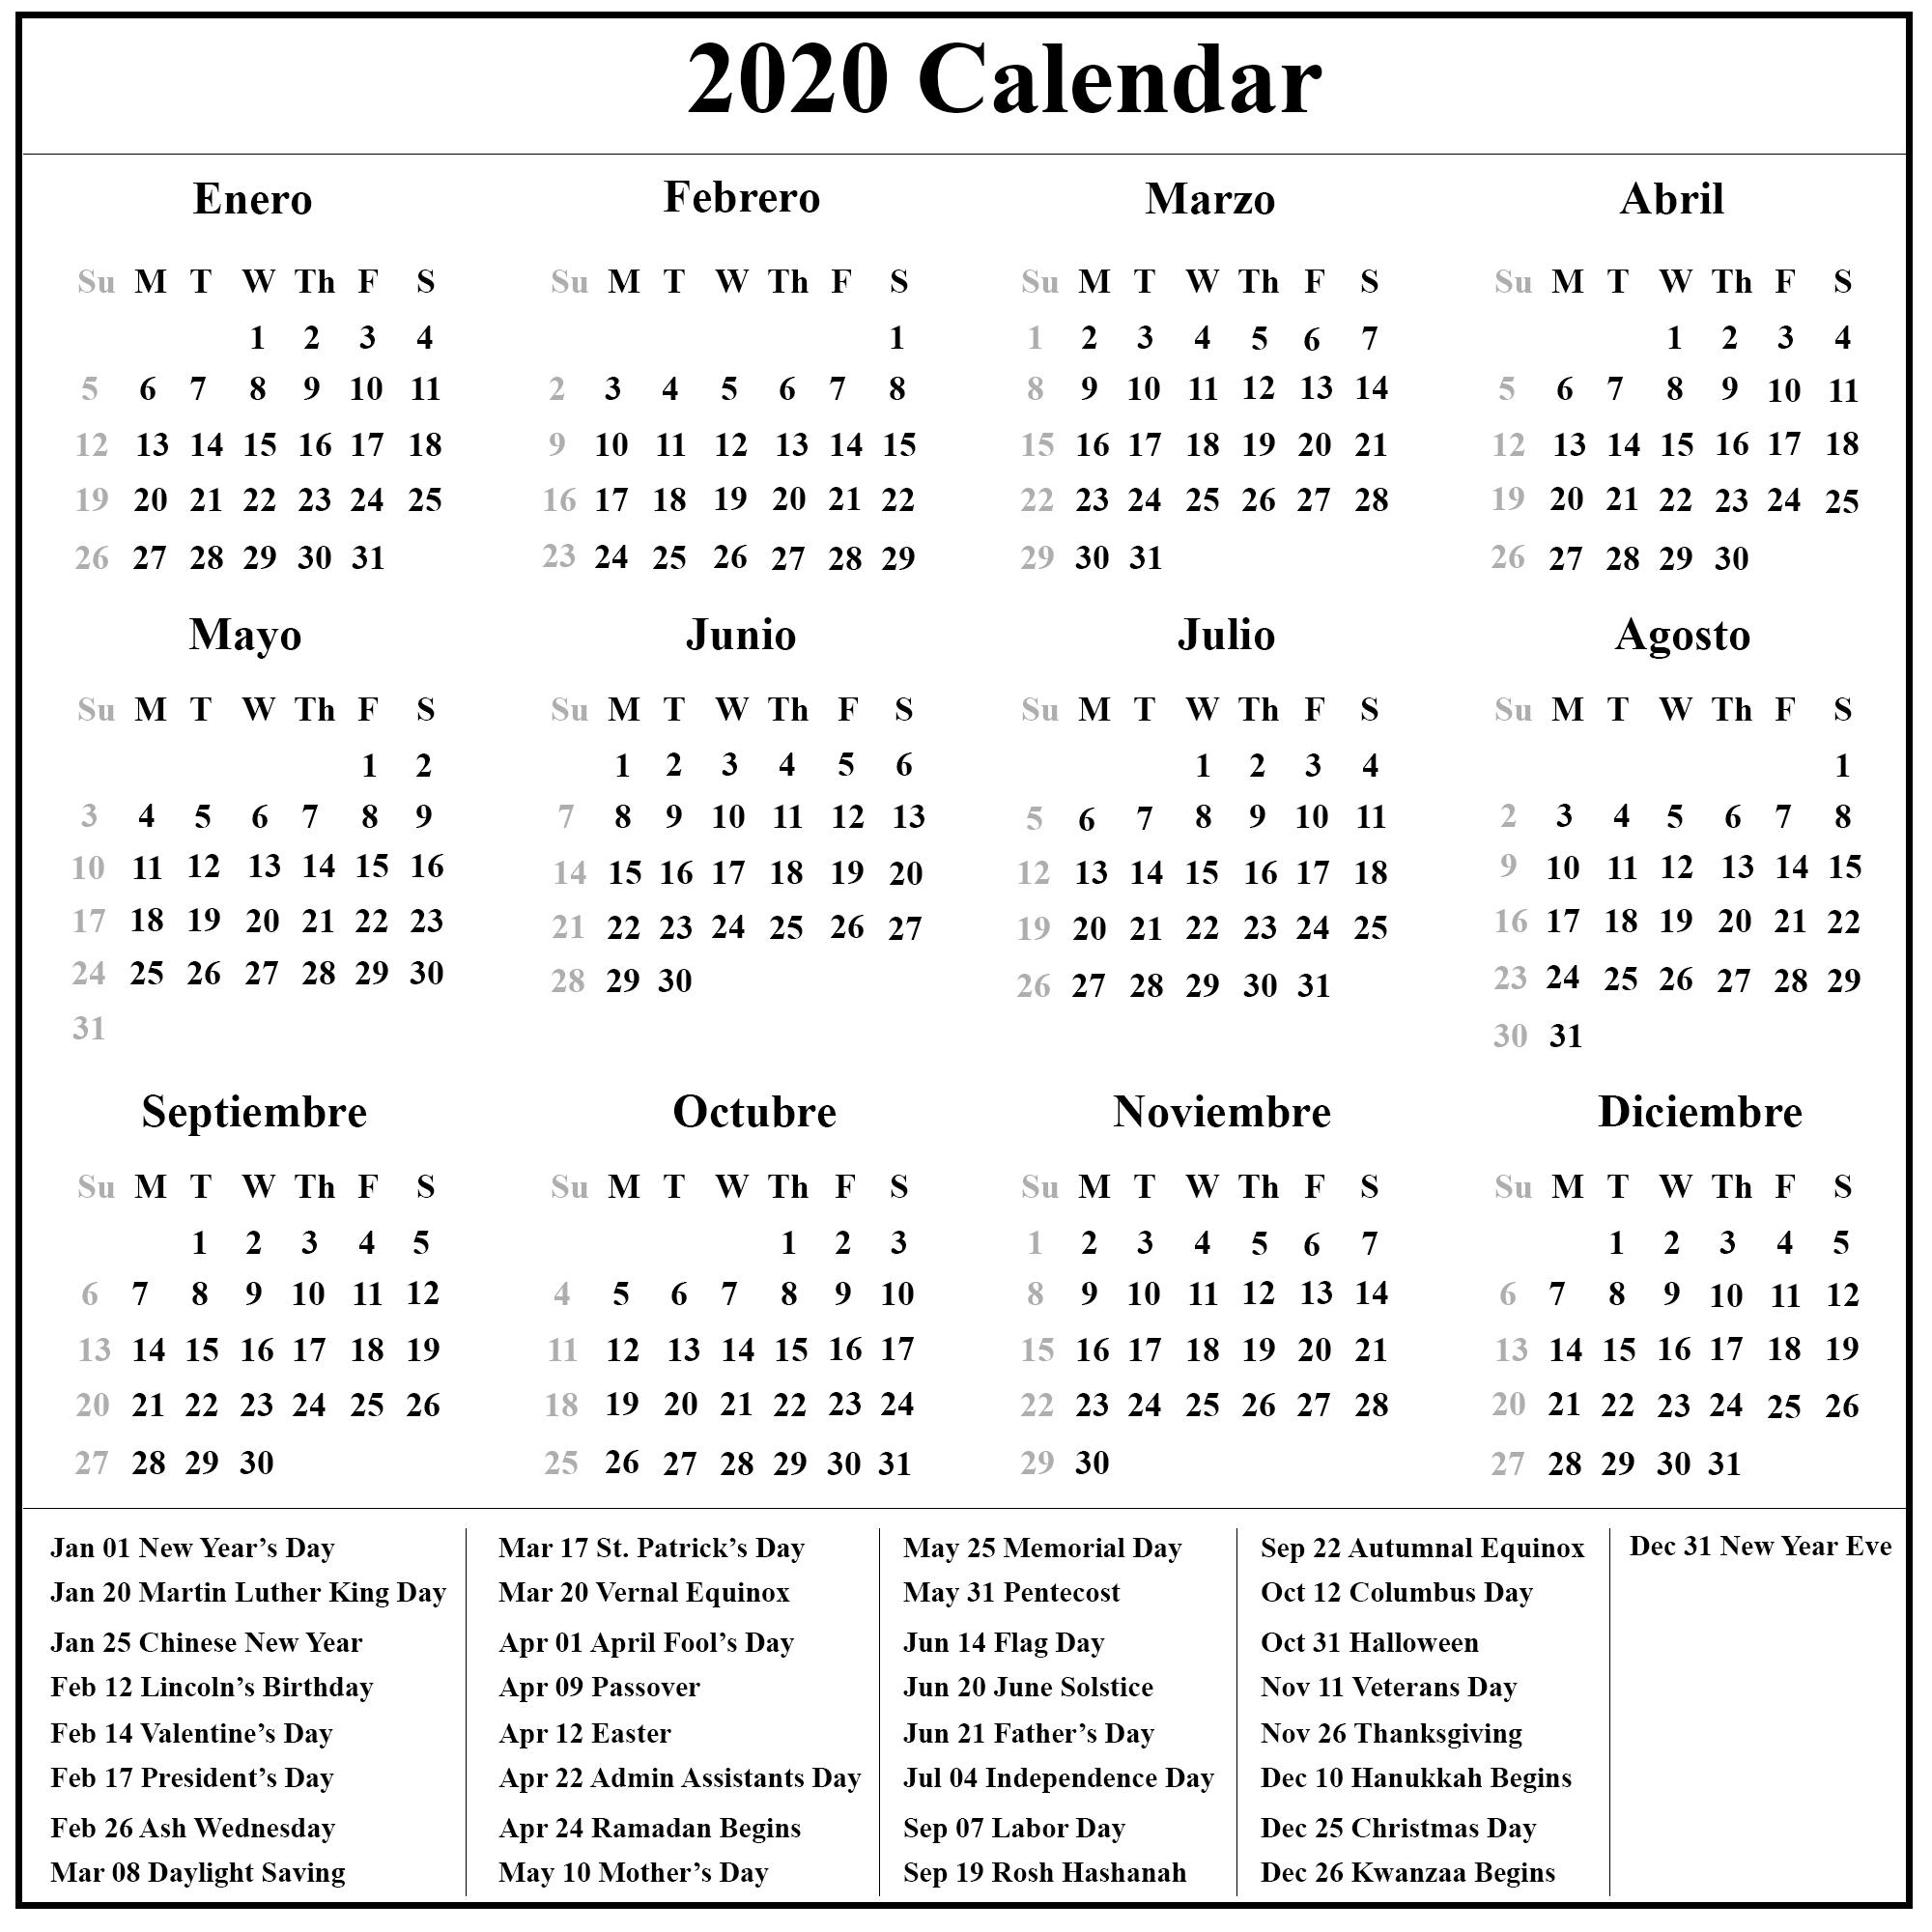 Free Printable Spanish Calendar 2020 | 2020 Calendario-2020 Calendar With Jewish Holidays Pdf